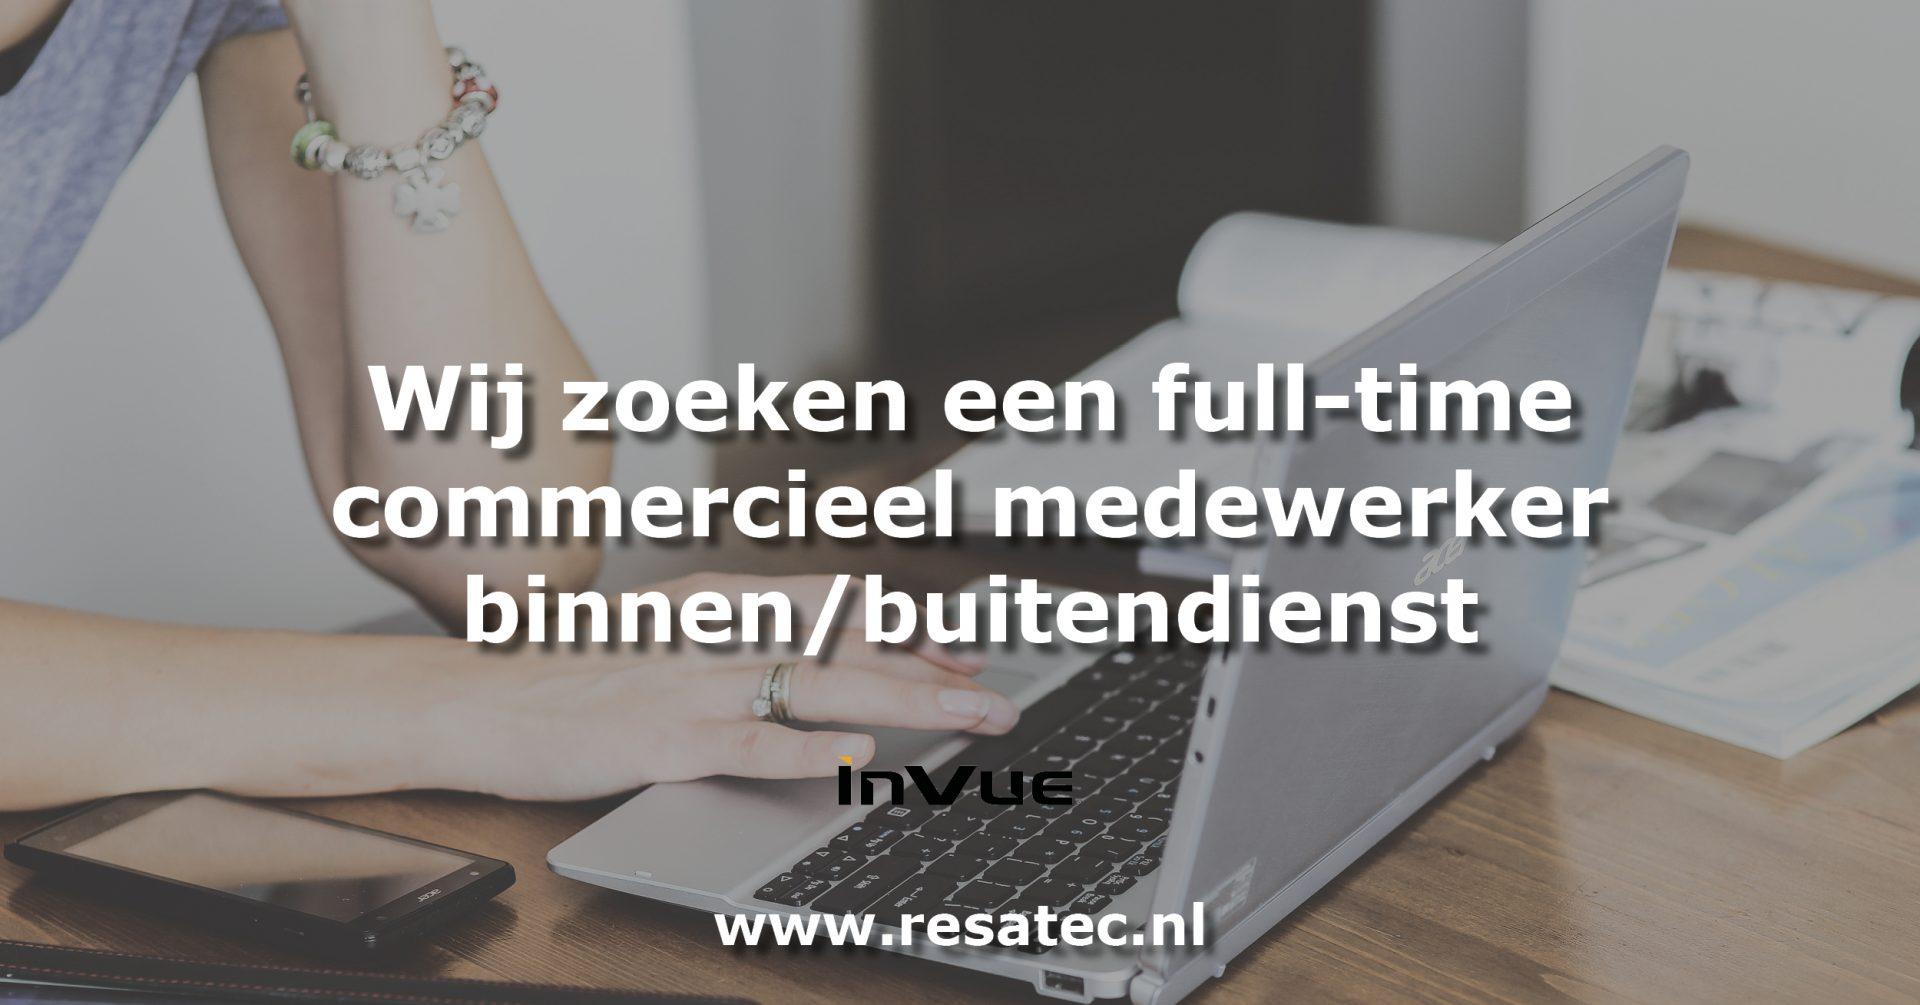 Vacature commercieel medewerker invue Nederland